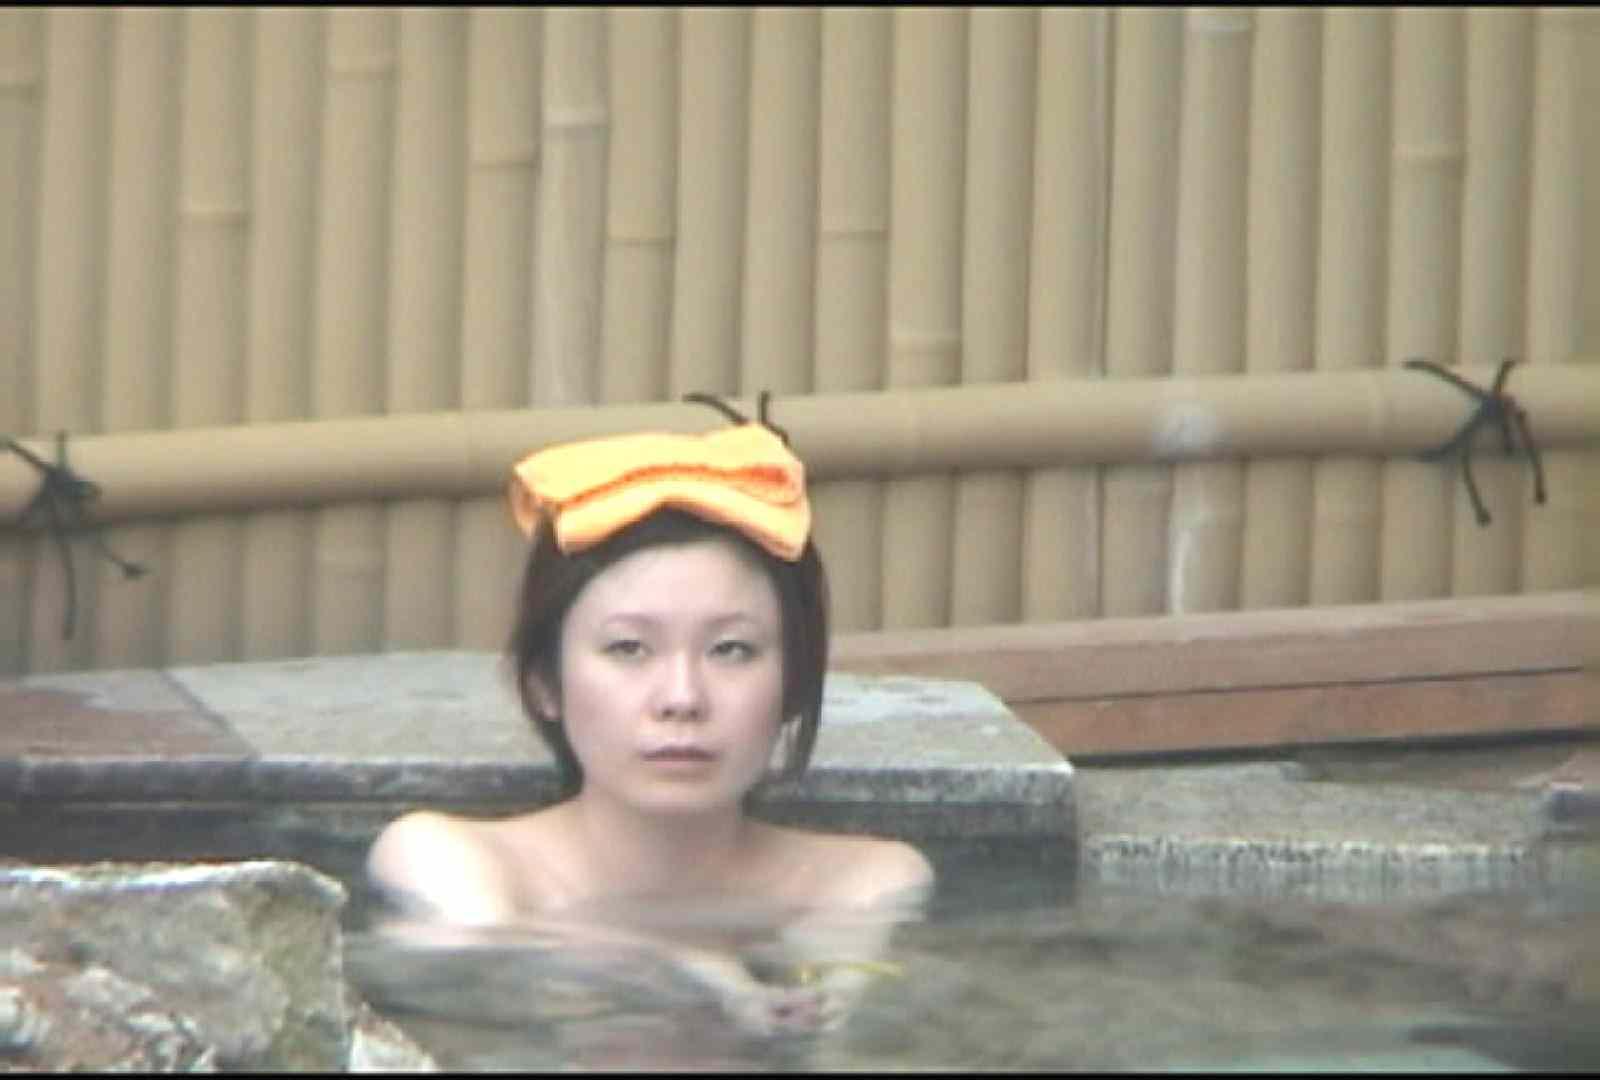 Aquaな露天風呂Vol.177 盗撮師作品  102pic 24